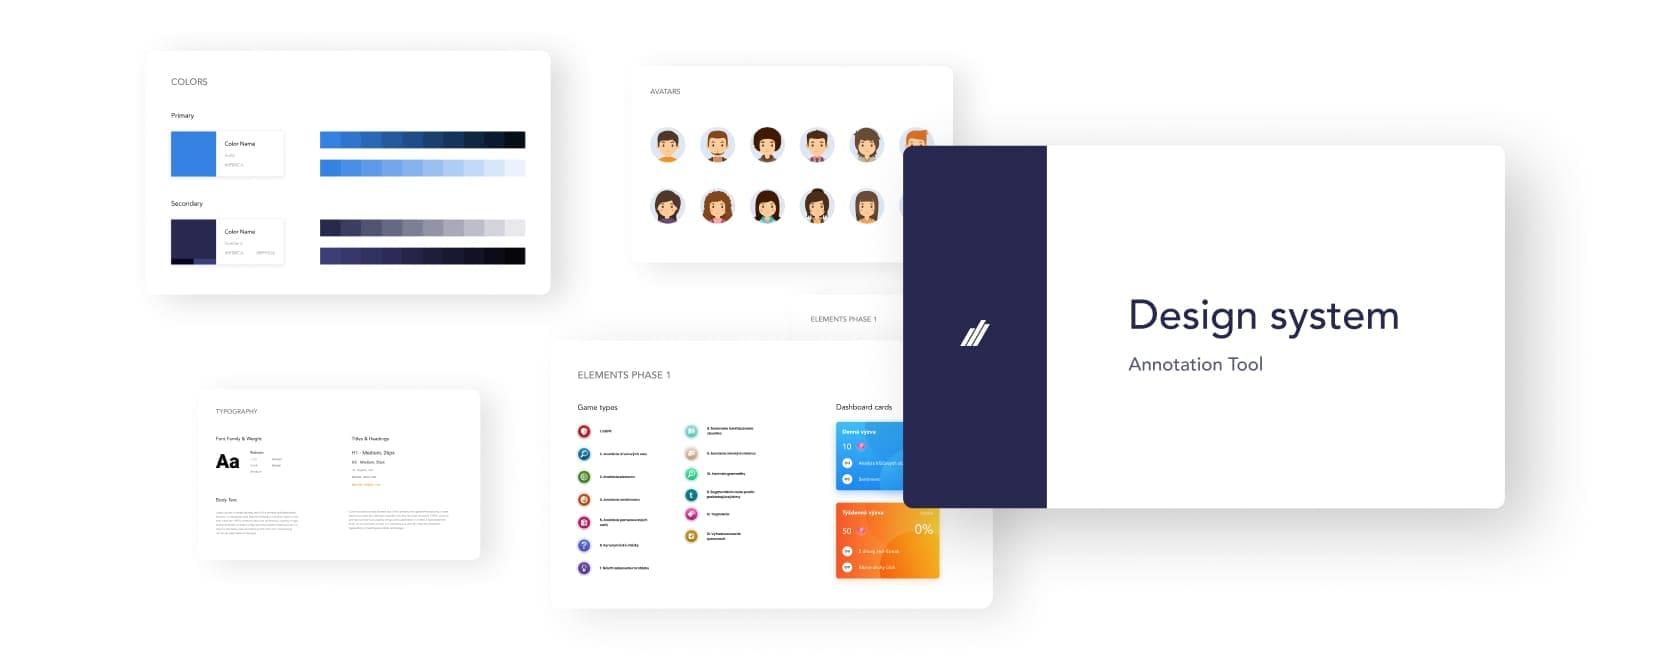 UX UI Design system ensures consistency across platforms